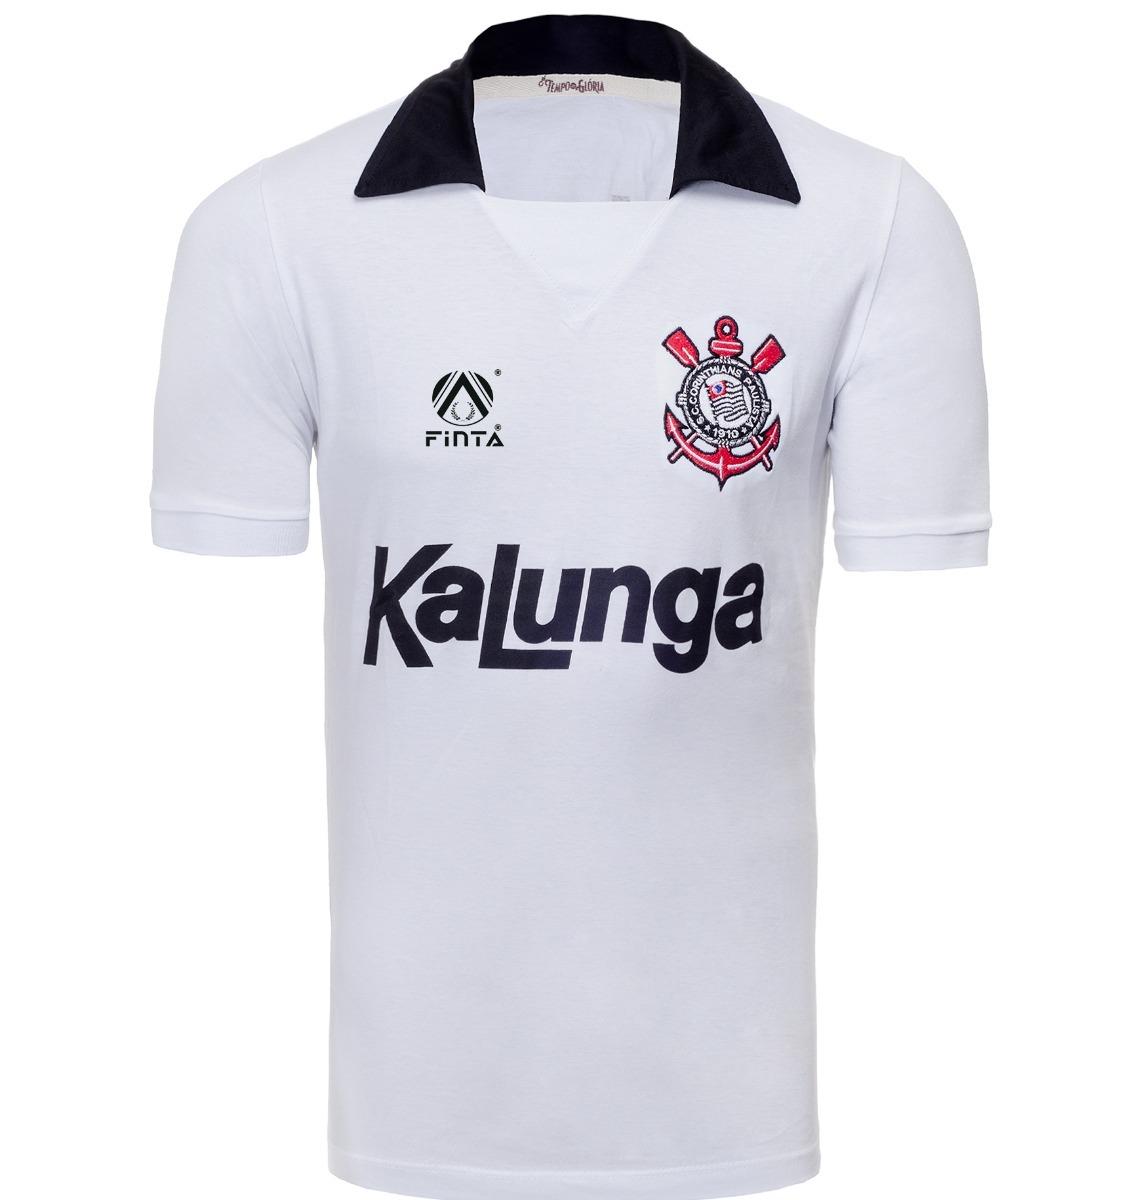 719c998f47777 Camiseta Retrô - Corinthians 1990 Kalunga - Branca - R  69